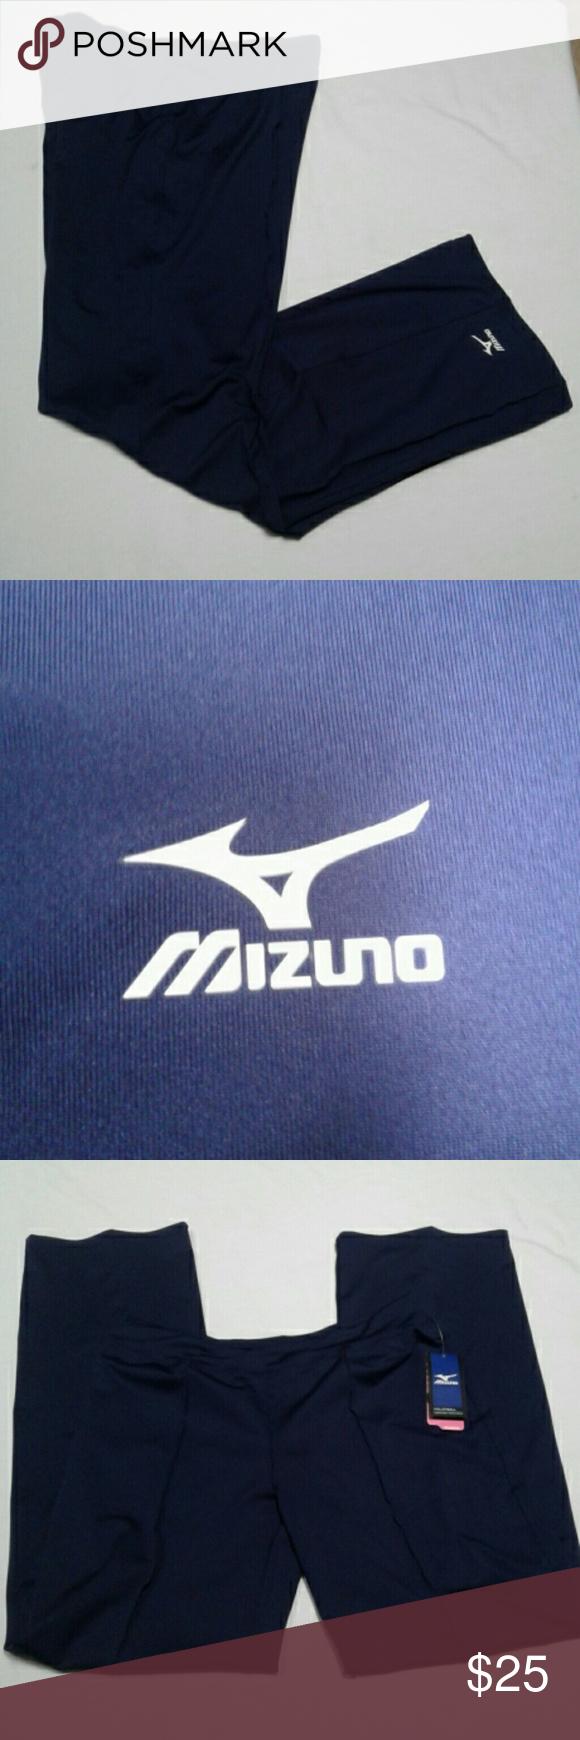 Nwt Mizuno Dri Lite Blue Volleyball Pants L Long Pants Mizuno Clothes Design